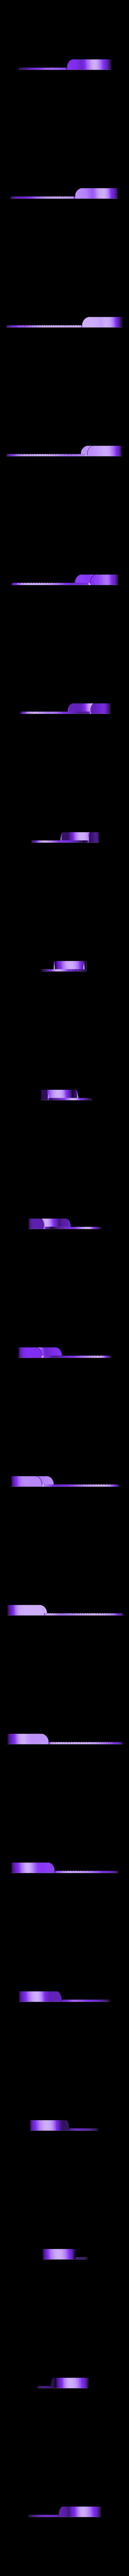 pedometre.STL Download free STL file pedimeter • Object to 3D print, Thomy